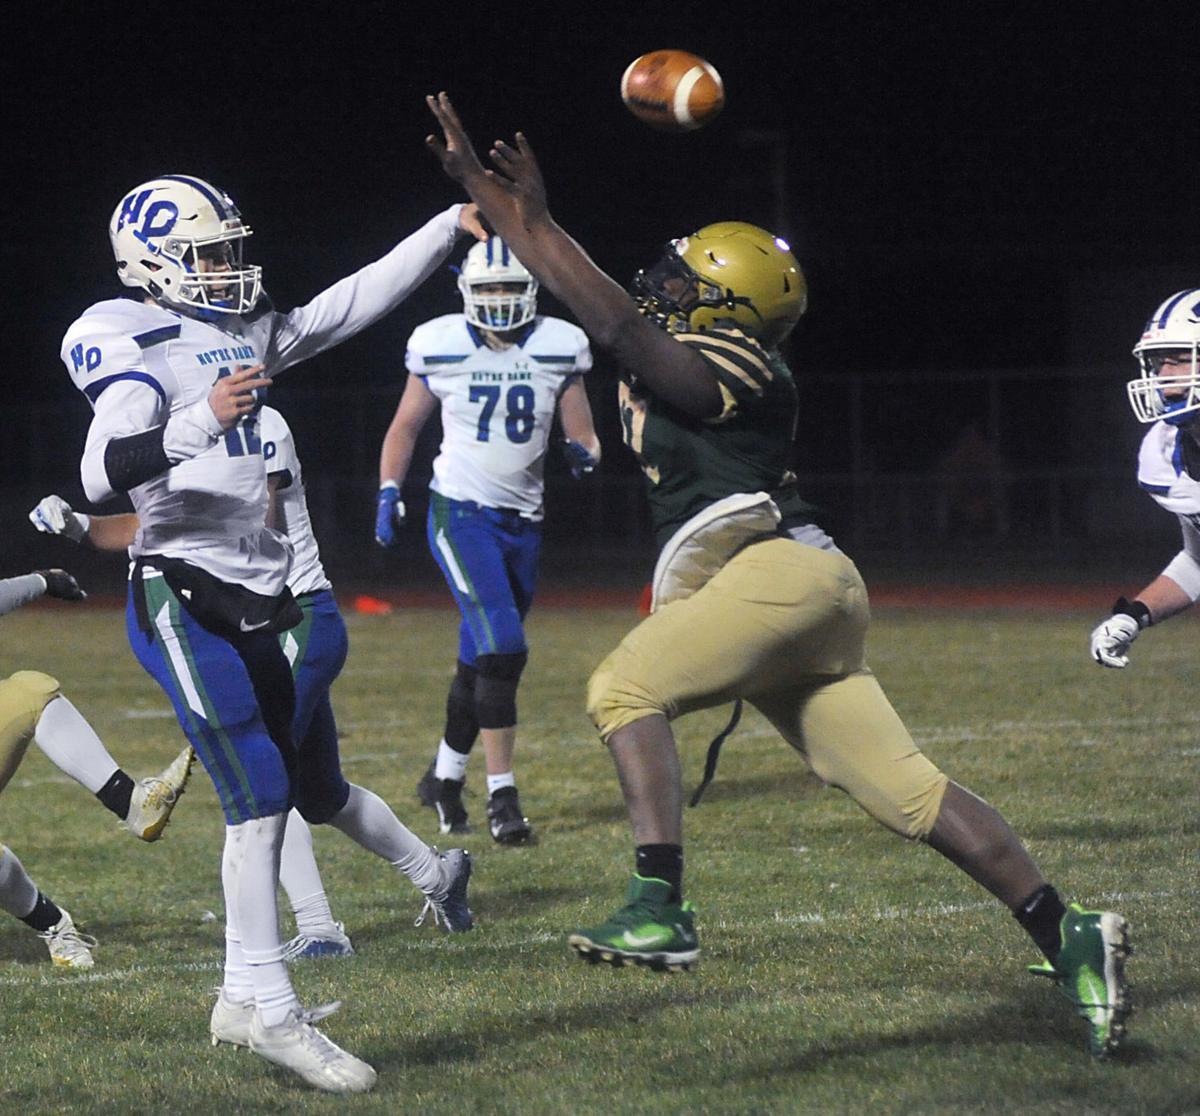 Pressuring the quarterback